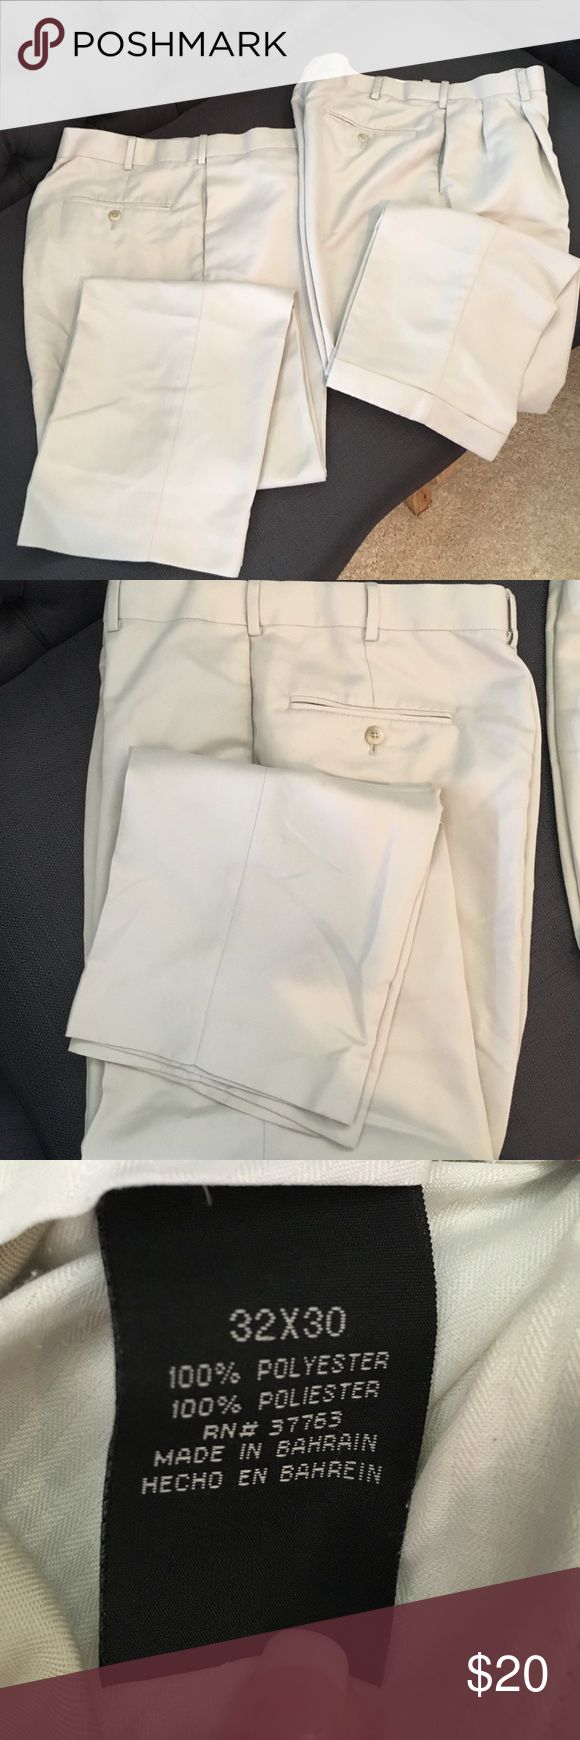 2 Pairs Men's Savane Kakis in great condition 2 Pairs Men's Savane Kakis in great condition Savane Pants